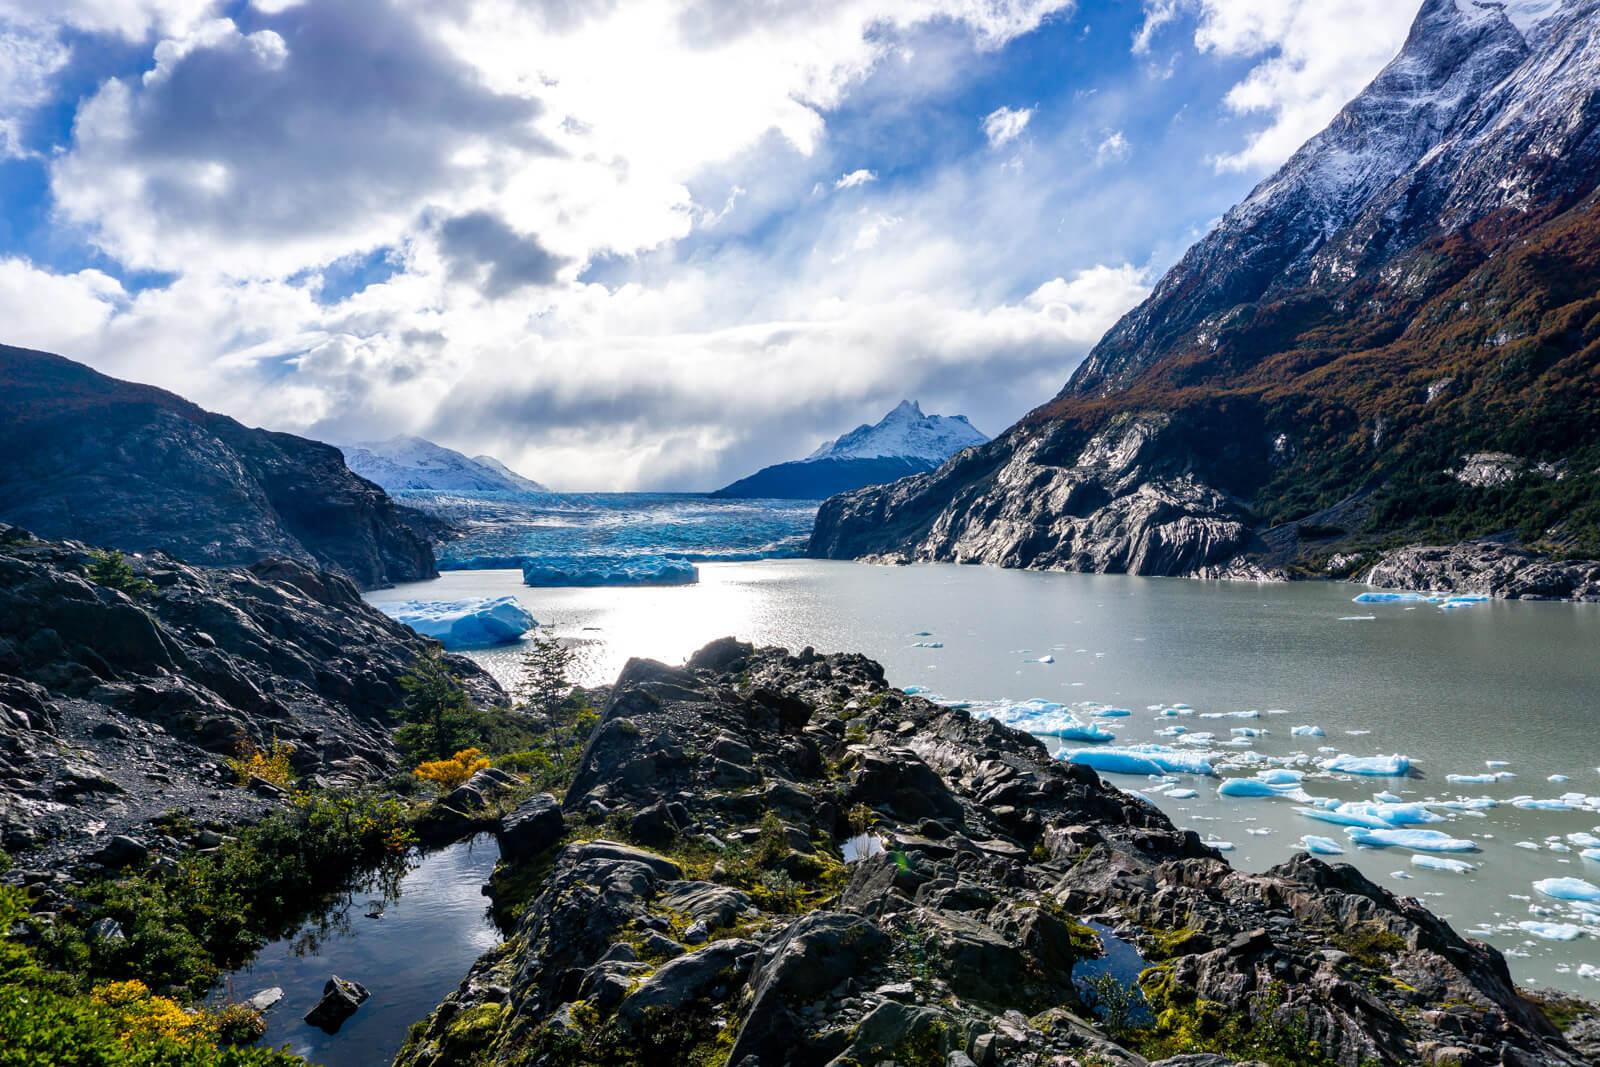 Torres del Paine W Trek Day 04 admiring the vastness of the Glacier Grey